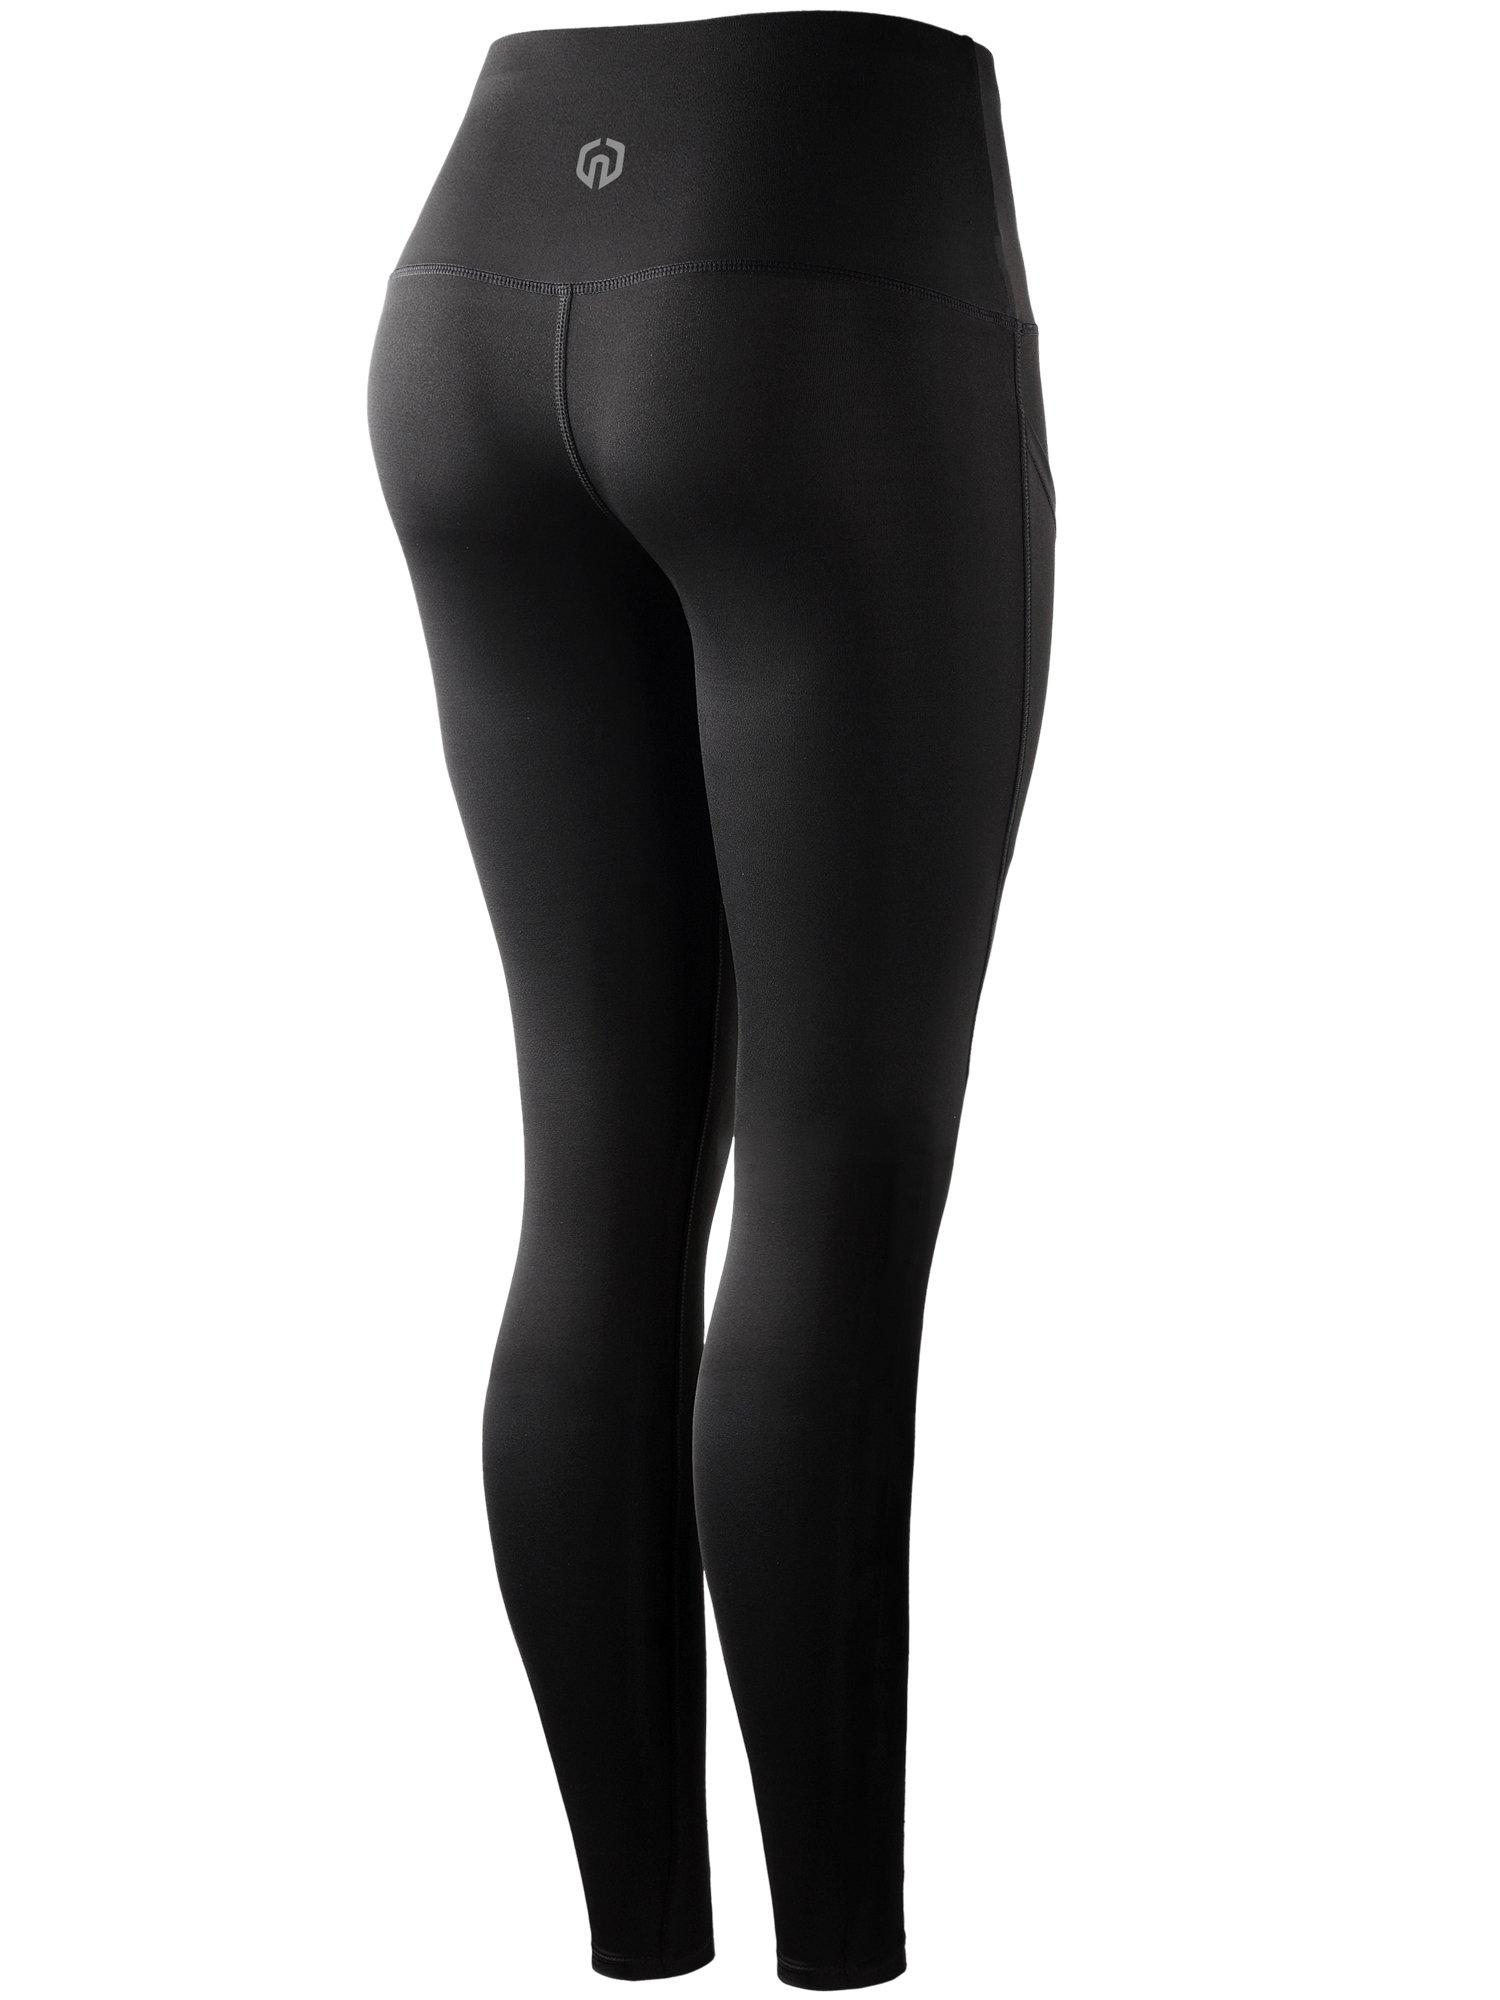 Neleus Tummy Control High Waist Running Workout Leggings,9017,One Piece,Black,S,EU M by Neleus (Image #2)